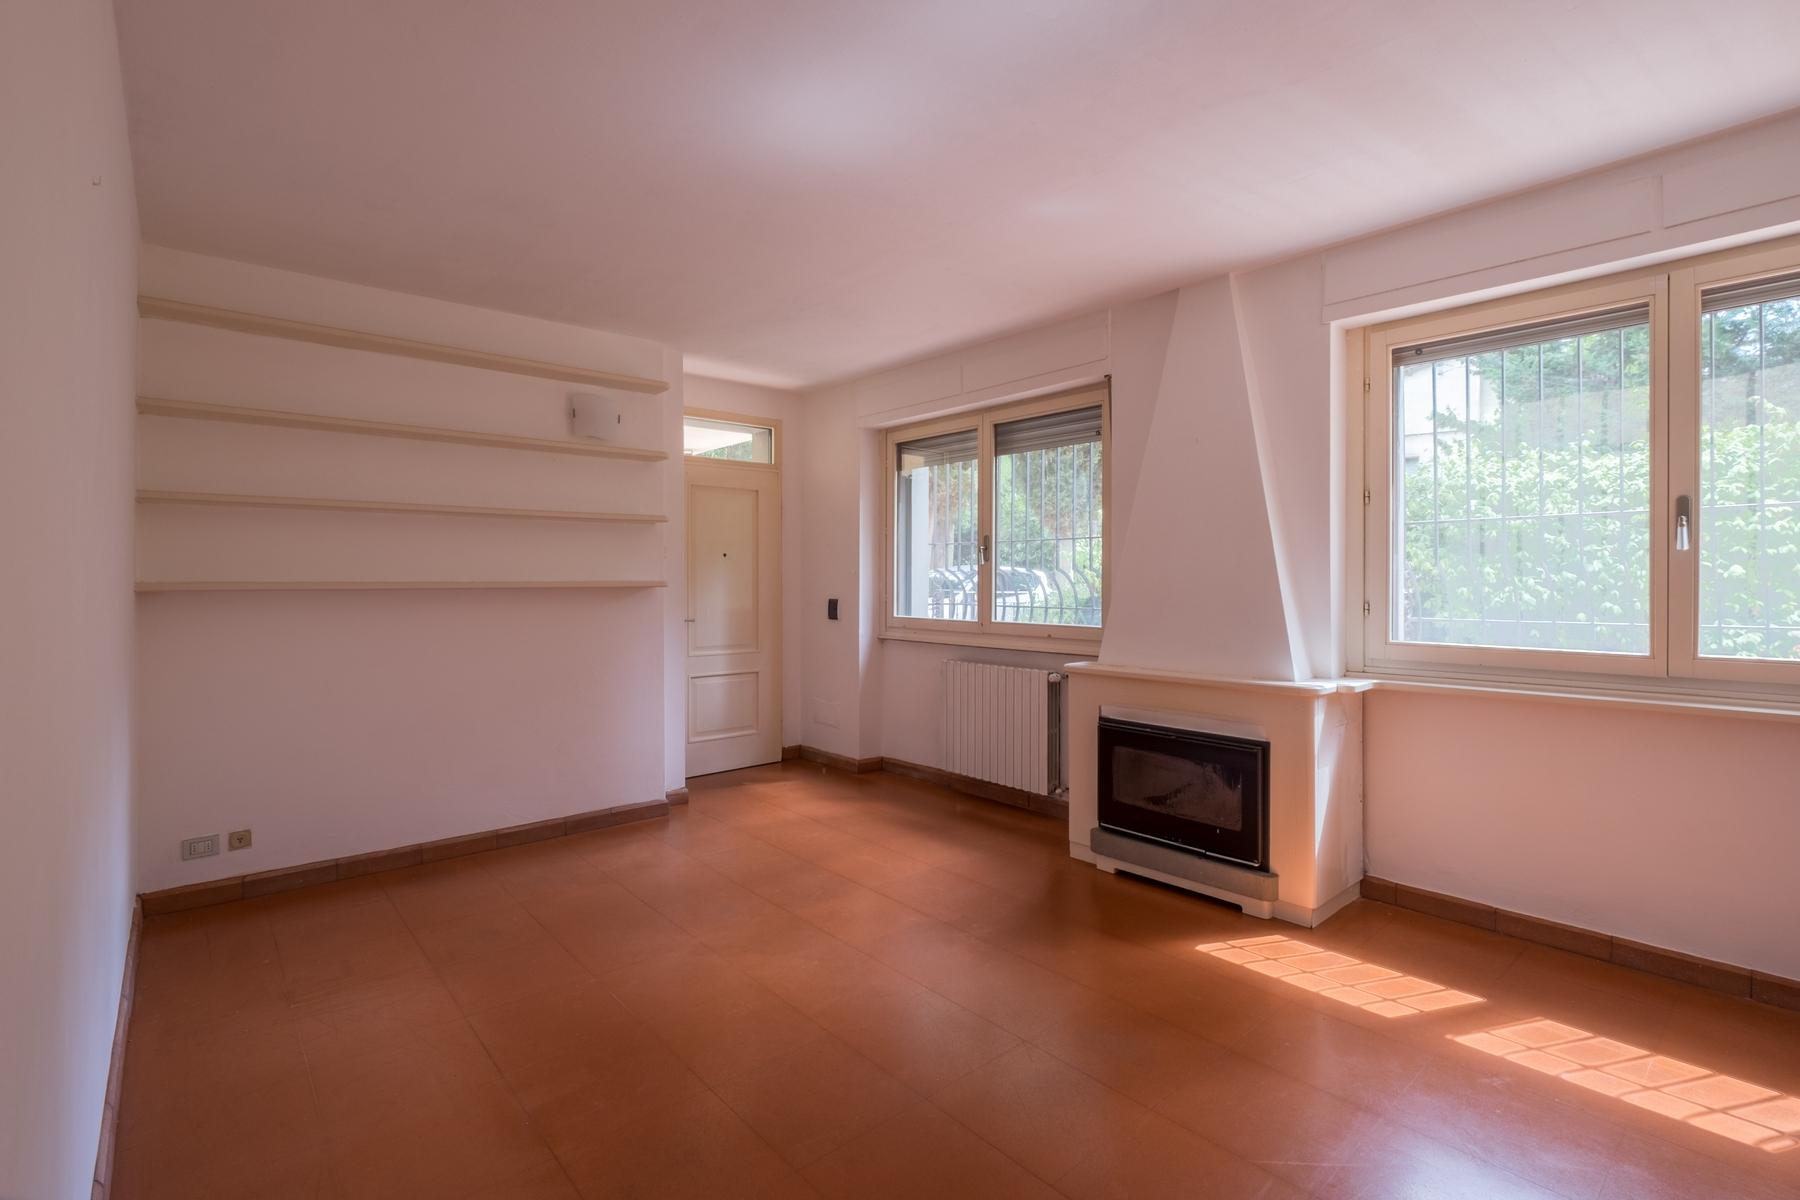 Schöne Wohnung in Poggio Imperiale - 6